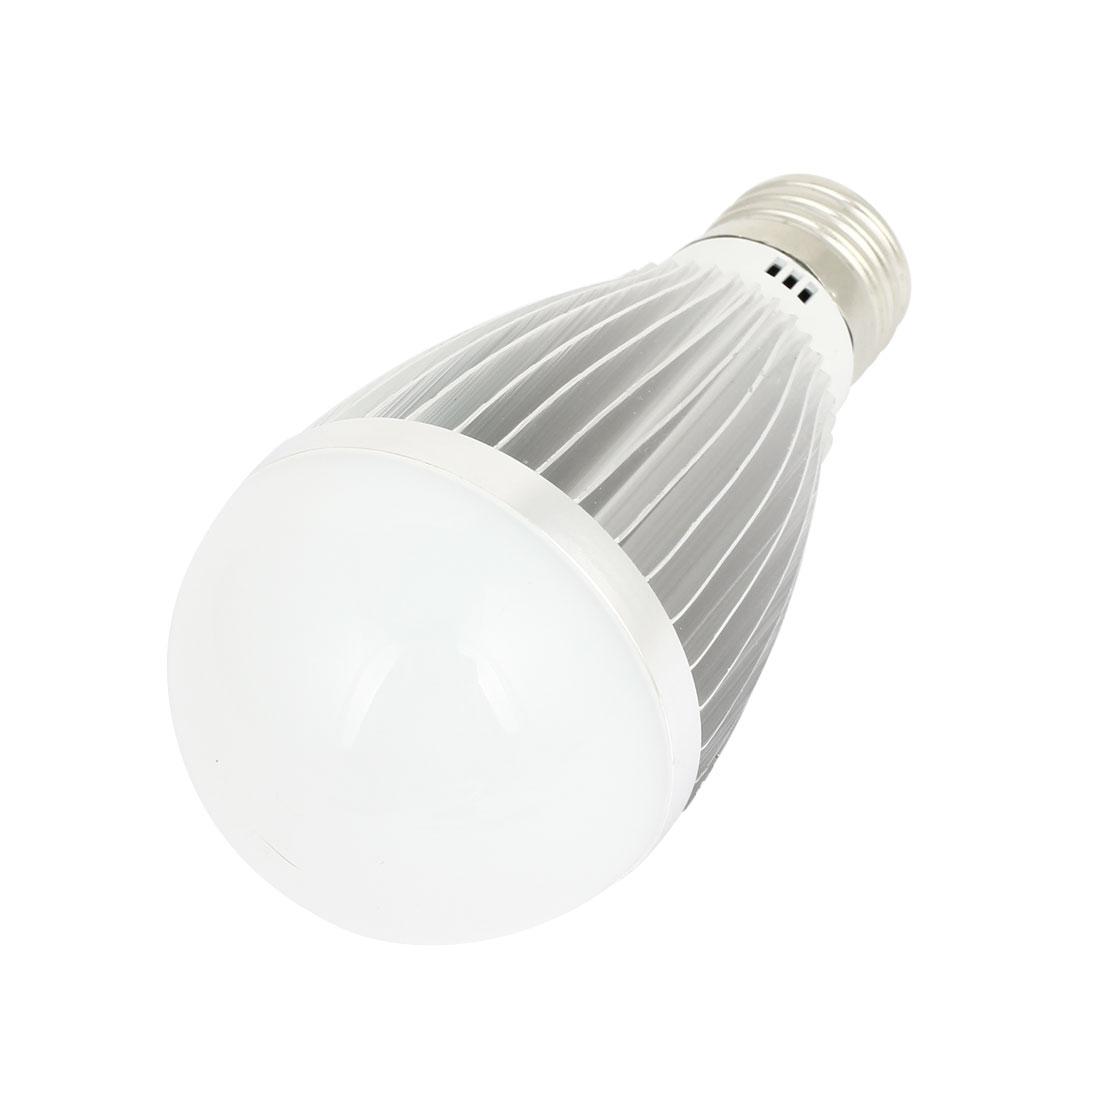 AC220V 7W 5500-6500K Pure White 14 LED E27 Screw Base Energy Saving Globe Light